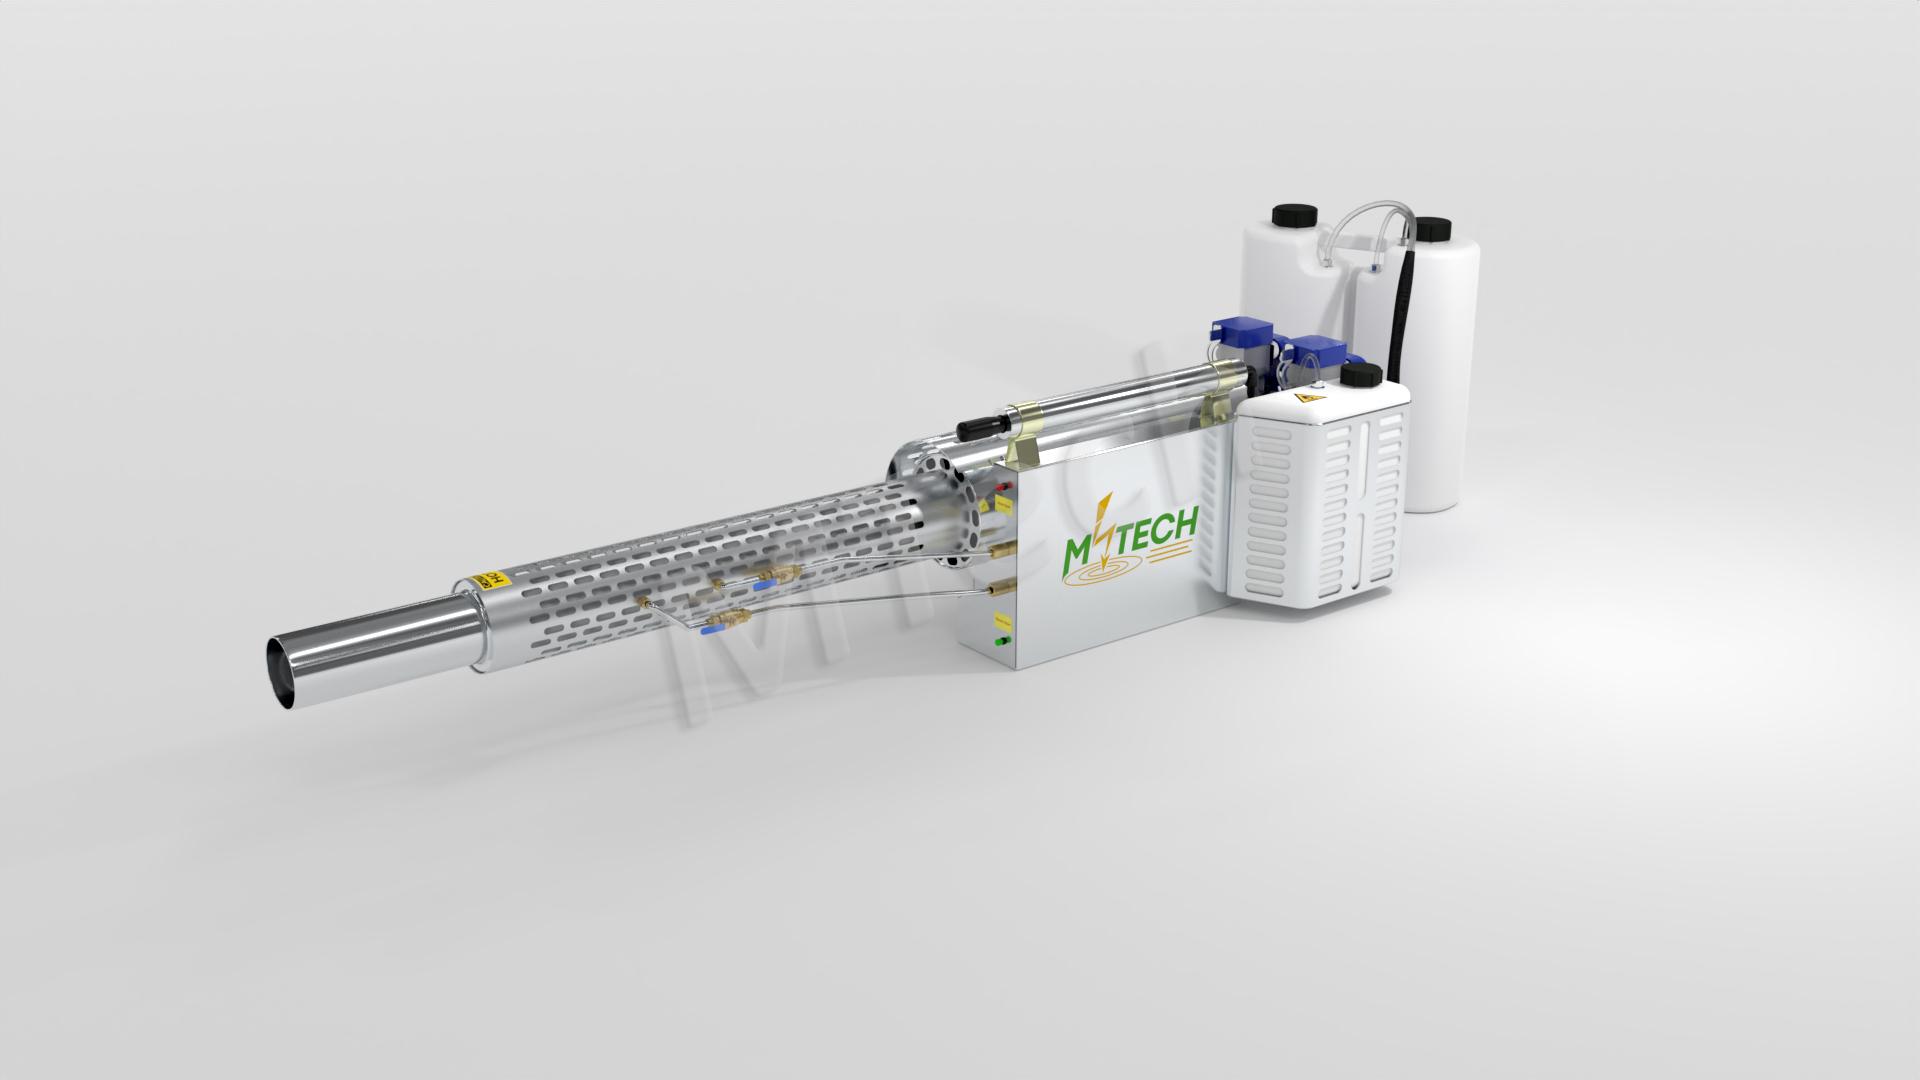 Mtech Nano 3 Gallons Ulv Smoke Pulse Gasoline Disinfector Thermal Fogger Sprayer 2-4um Up To 40ft Outside Inside MODEL M75